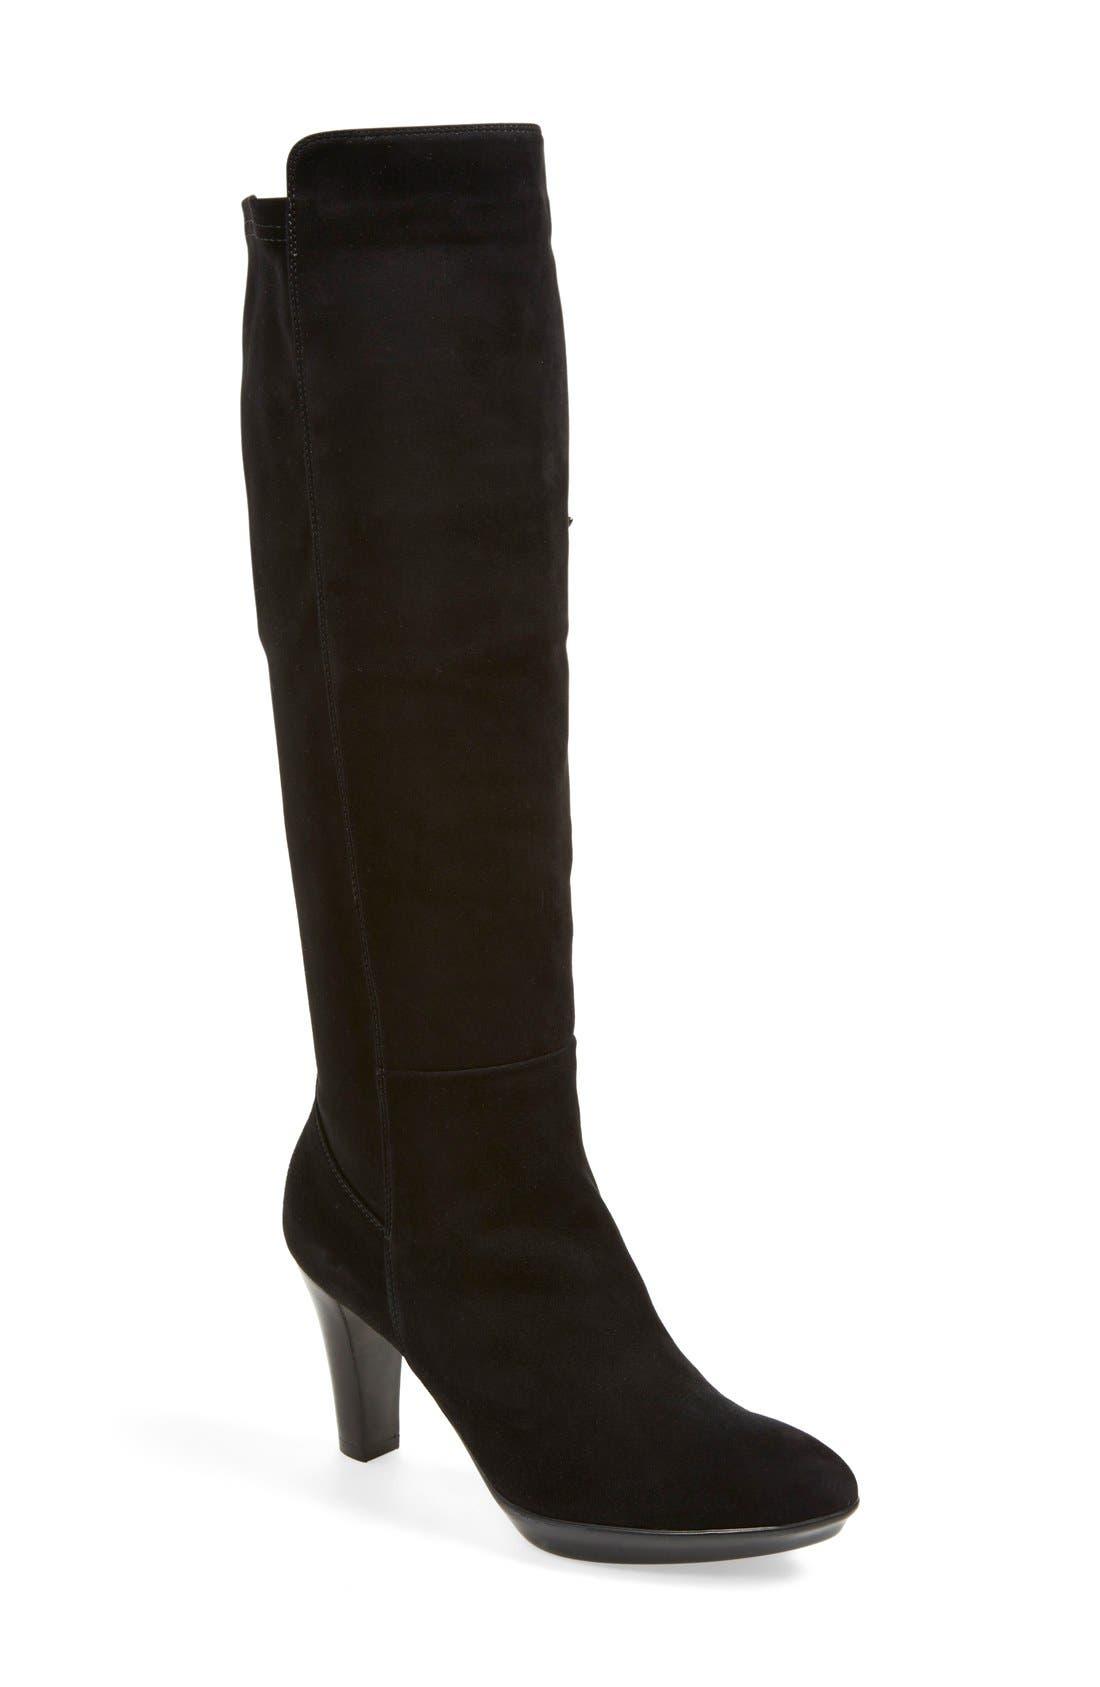 Alternate Image 1 Selected - Aquatalia 'Raine' Weatherproof Tall Boot (Women)